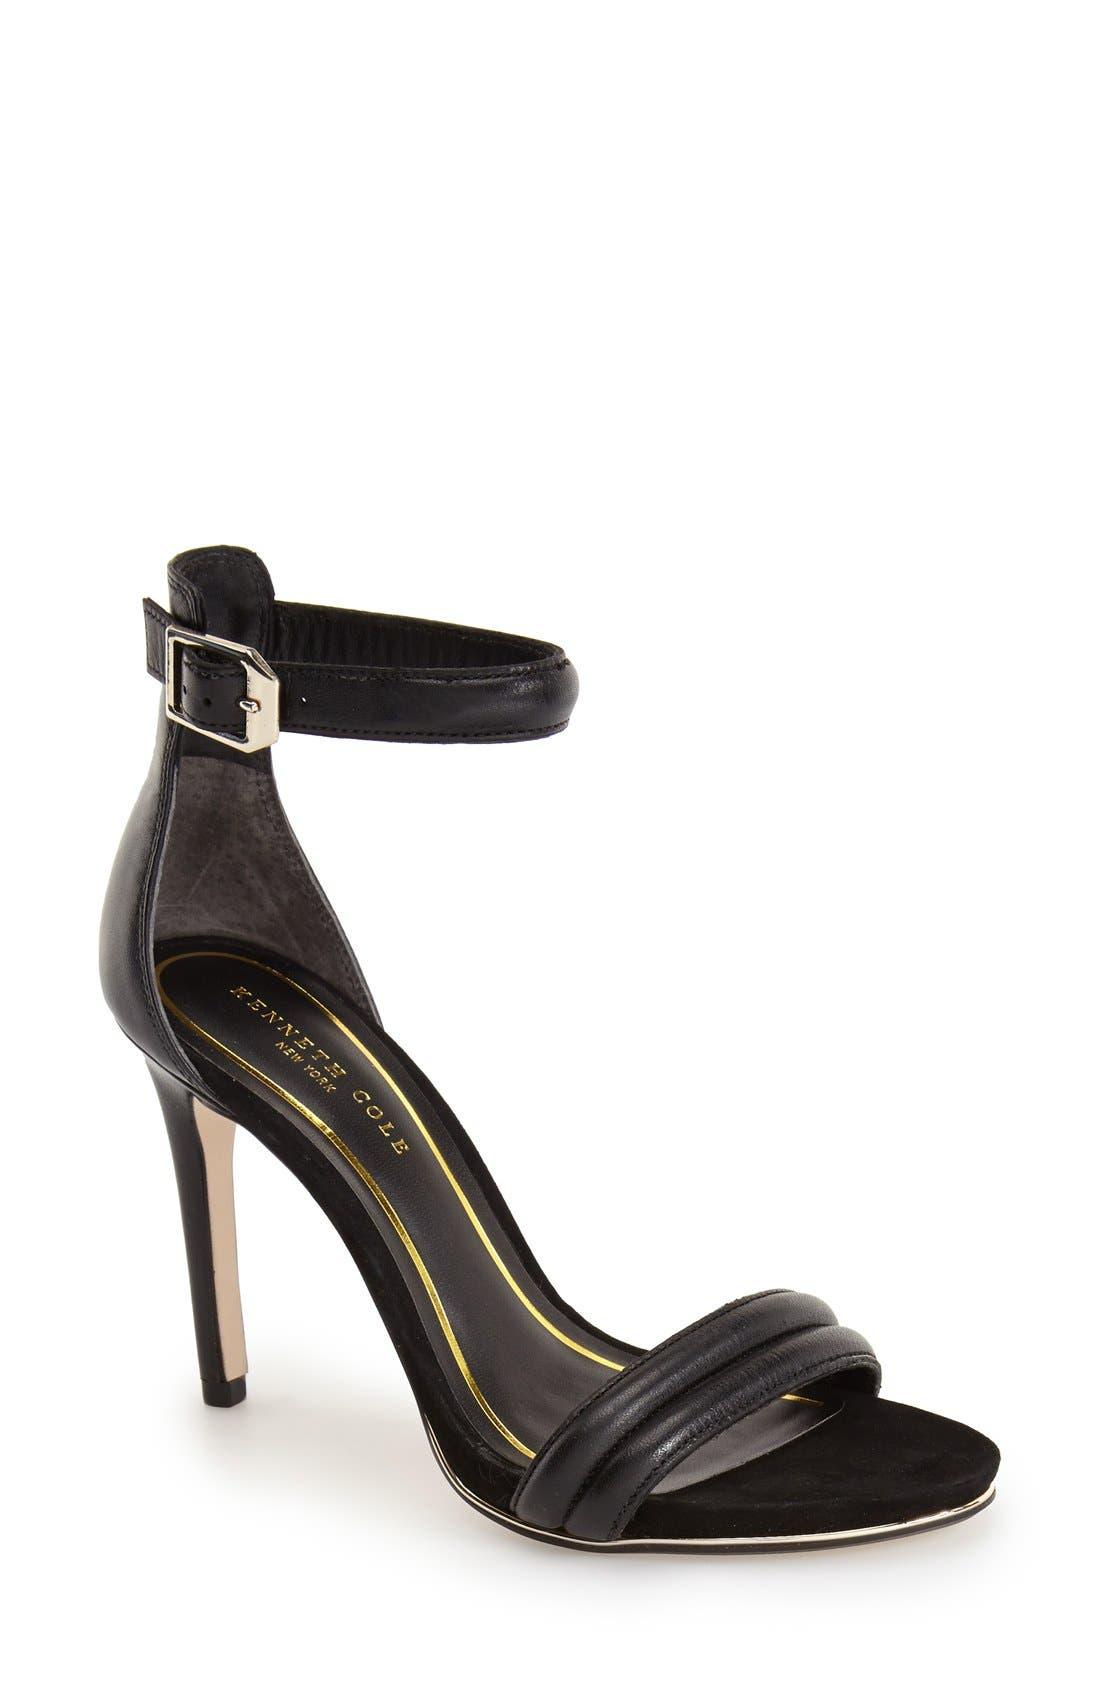 KENNETH COLE NEW YORK 'Brooke' Ankle Strap Sandal, Main, color, BLACK LEATHER